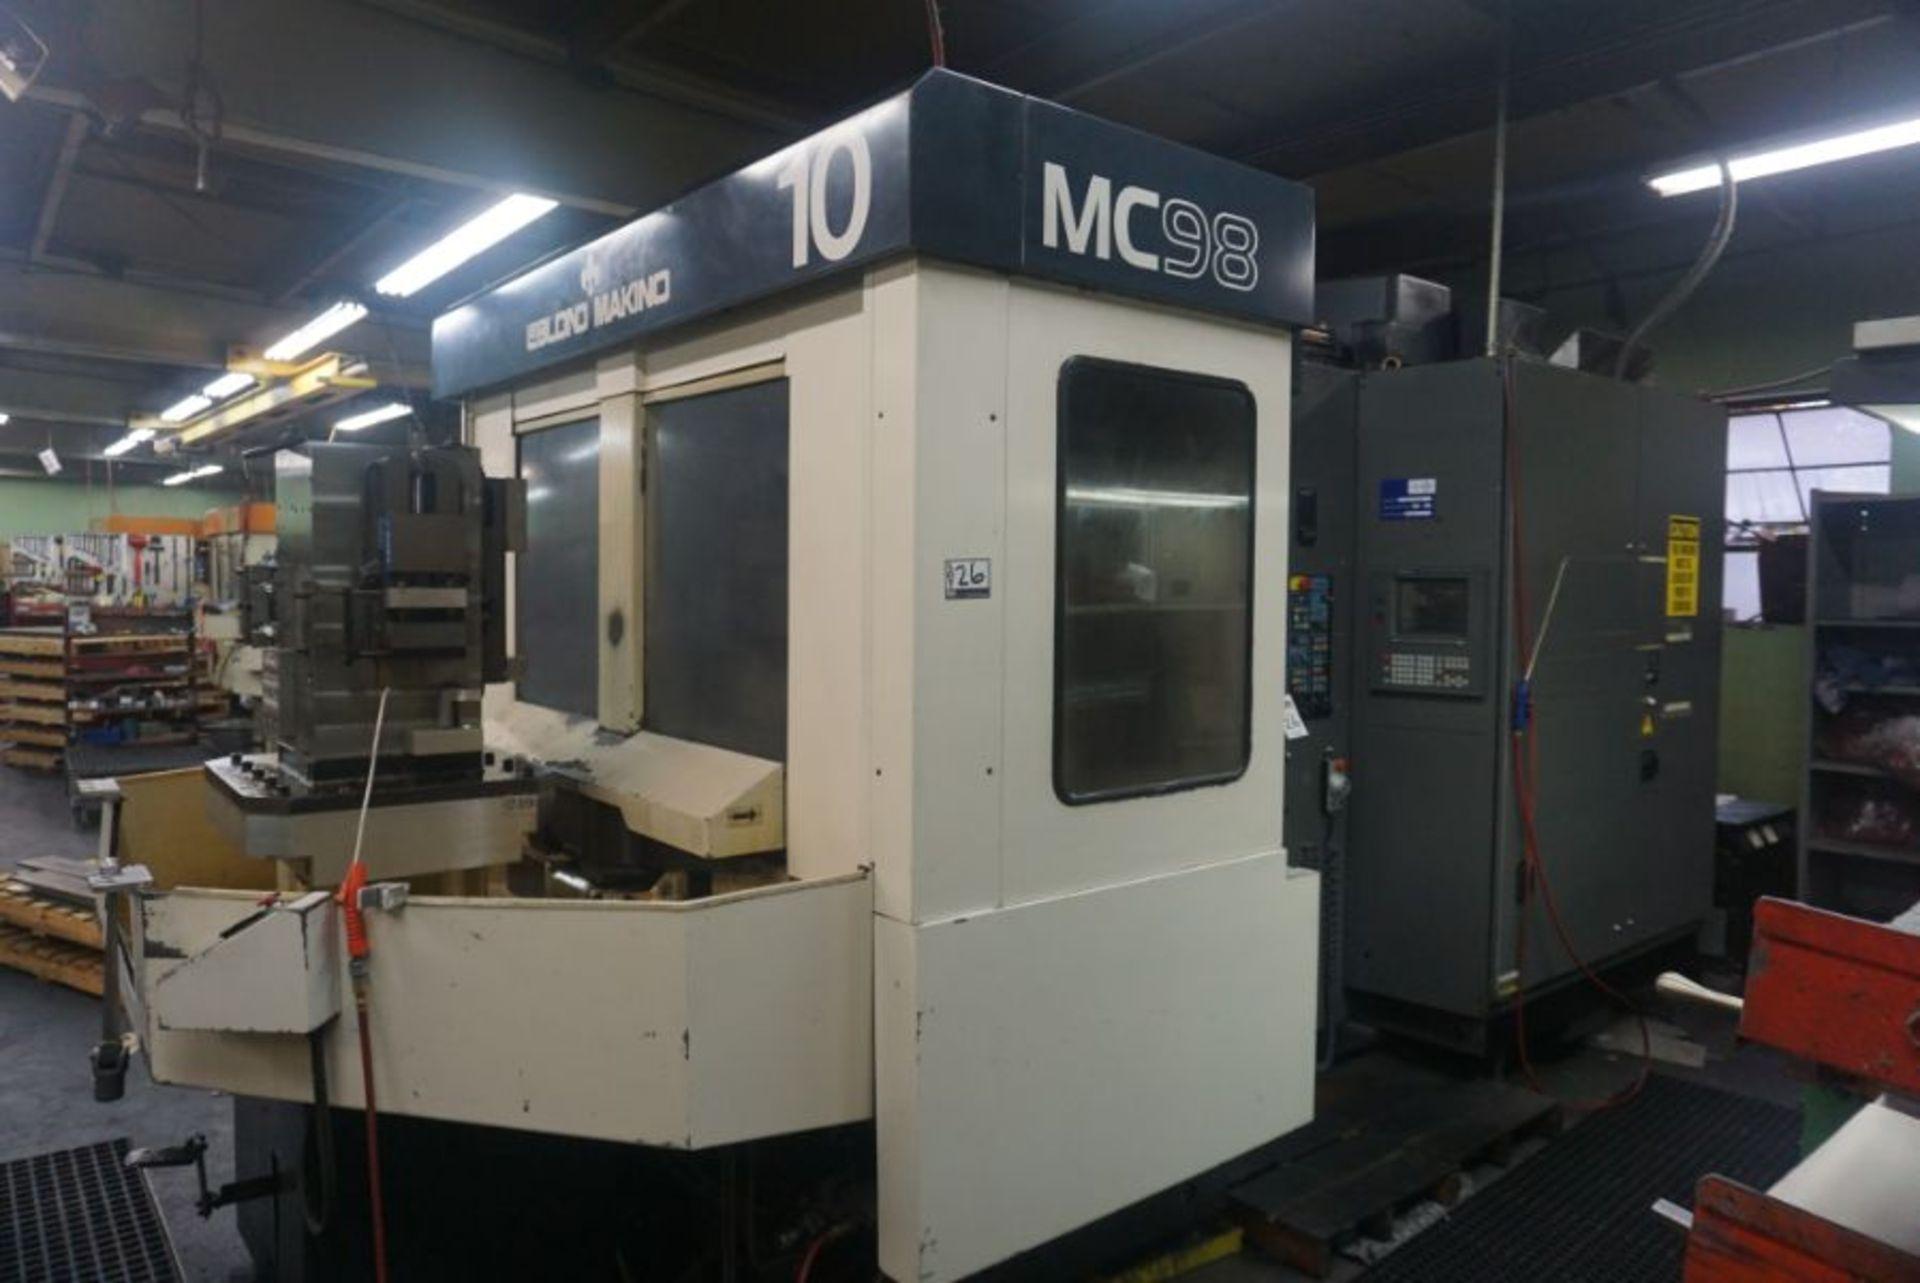 Makino MC98-A99 4-Axis Horizontal Machining Center, Fanuc 16 Pro 3 Control, New 1991